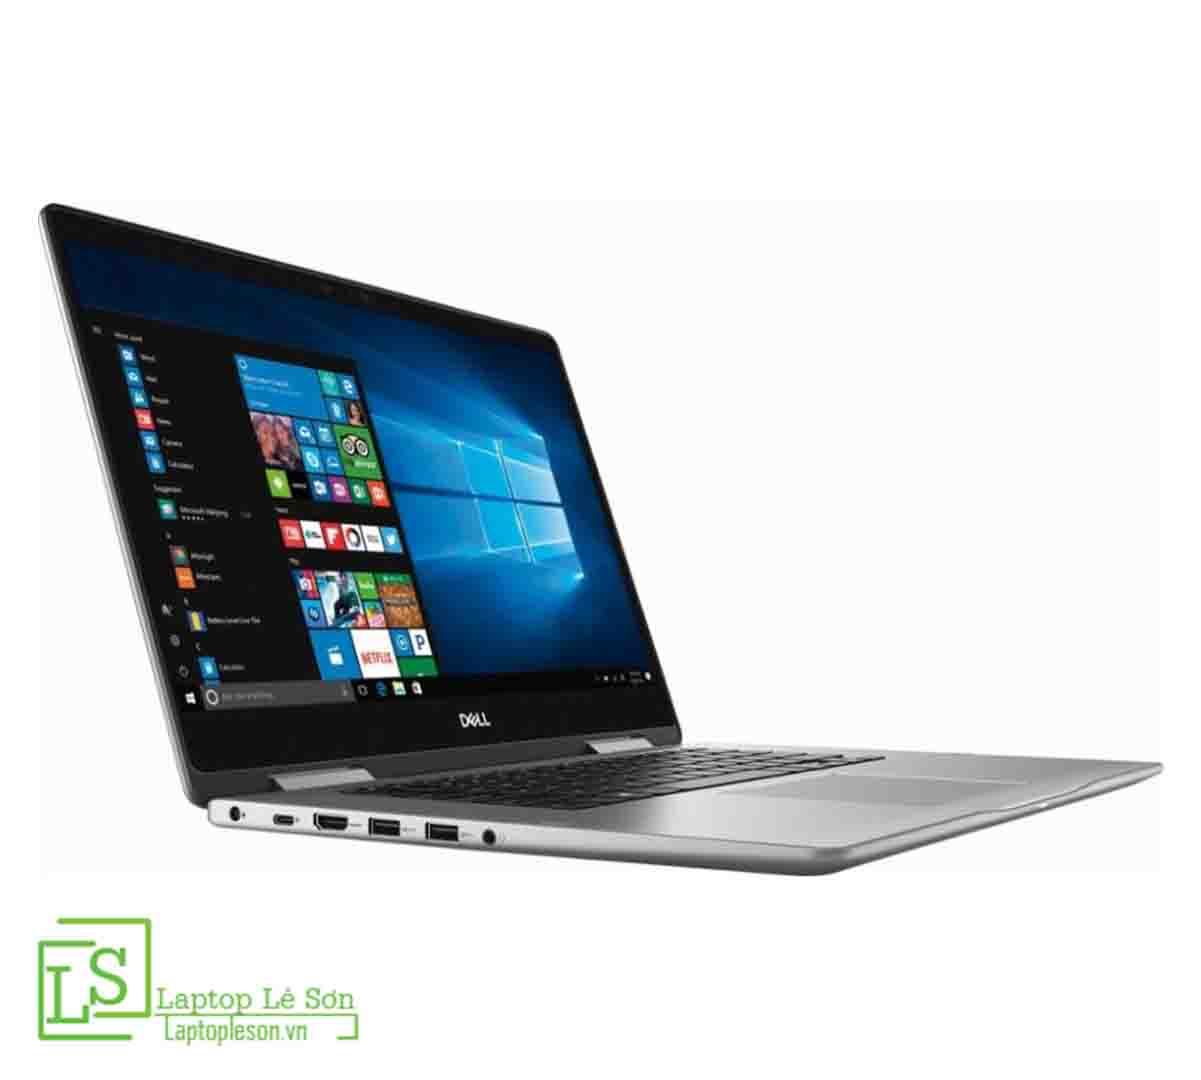 Dell Inspiron 7Dell Inspiron 7573 Laptop Lê Sơn 02573 Laptop Lê Sơn 02